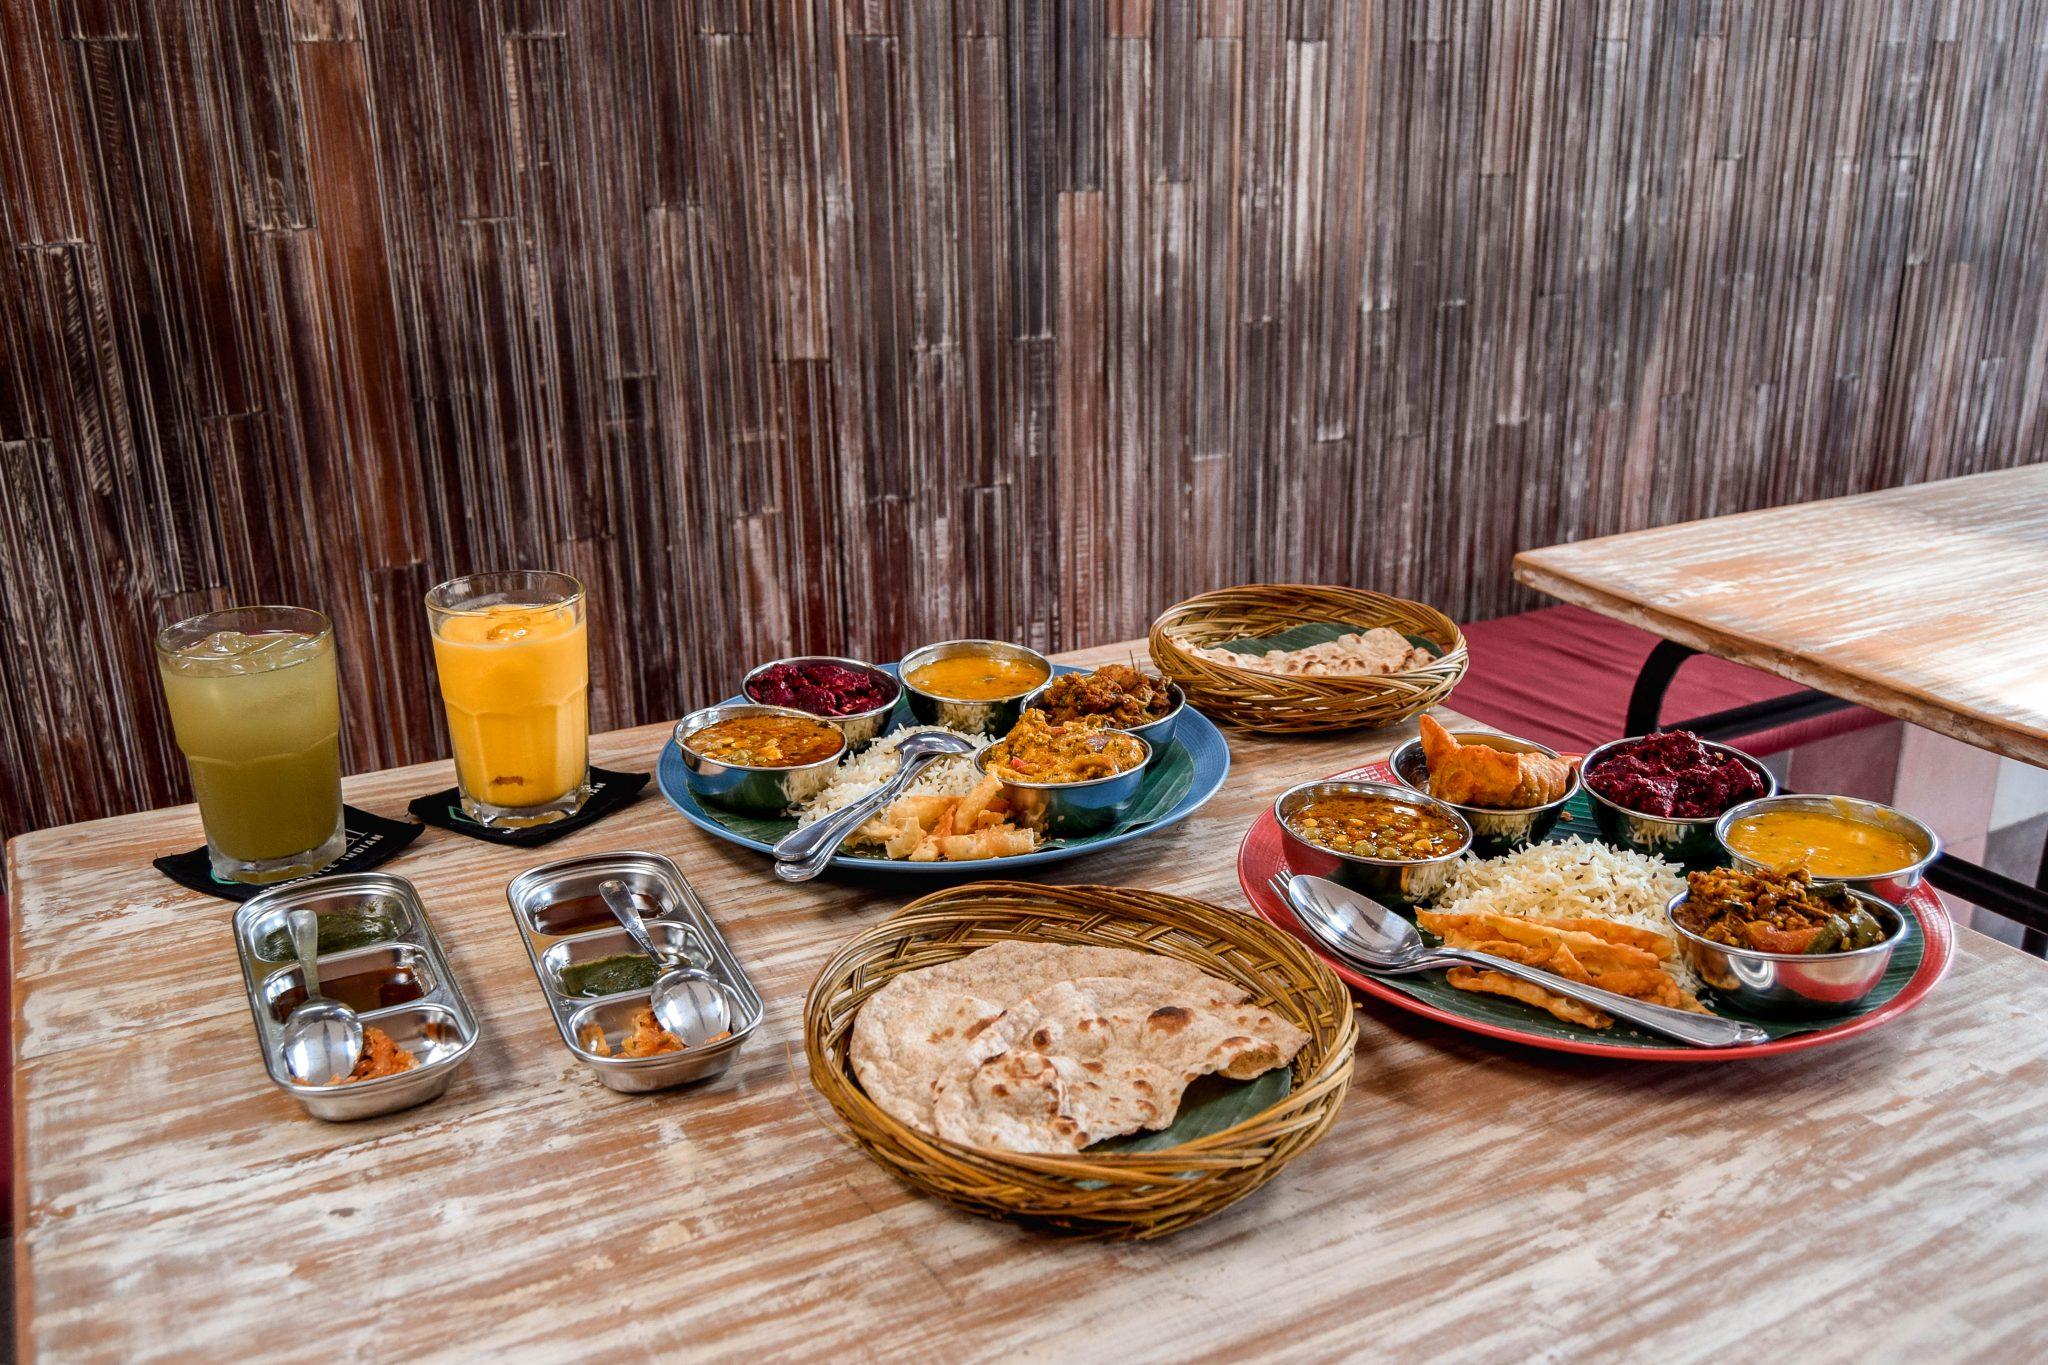 Wanderers & Warriors - Roti Daal Asia Berawa Bali Homestyle Indian - Best Restaurants In Bali Restaurants - Best Restaurants In Berawa - Indian Food In Bali